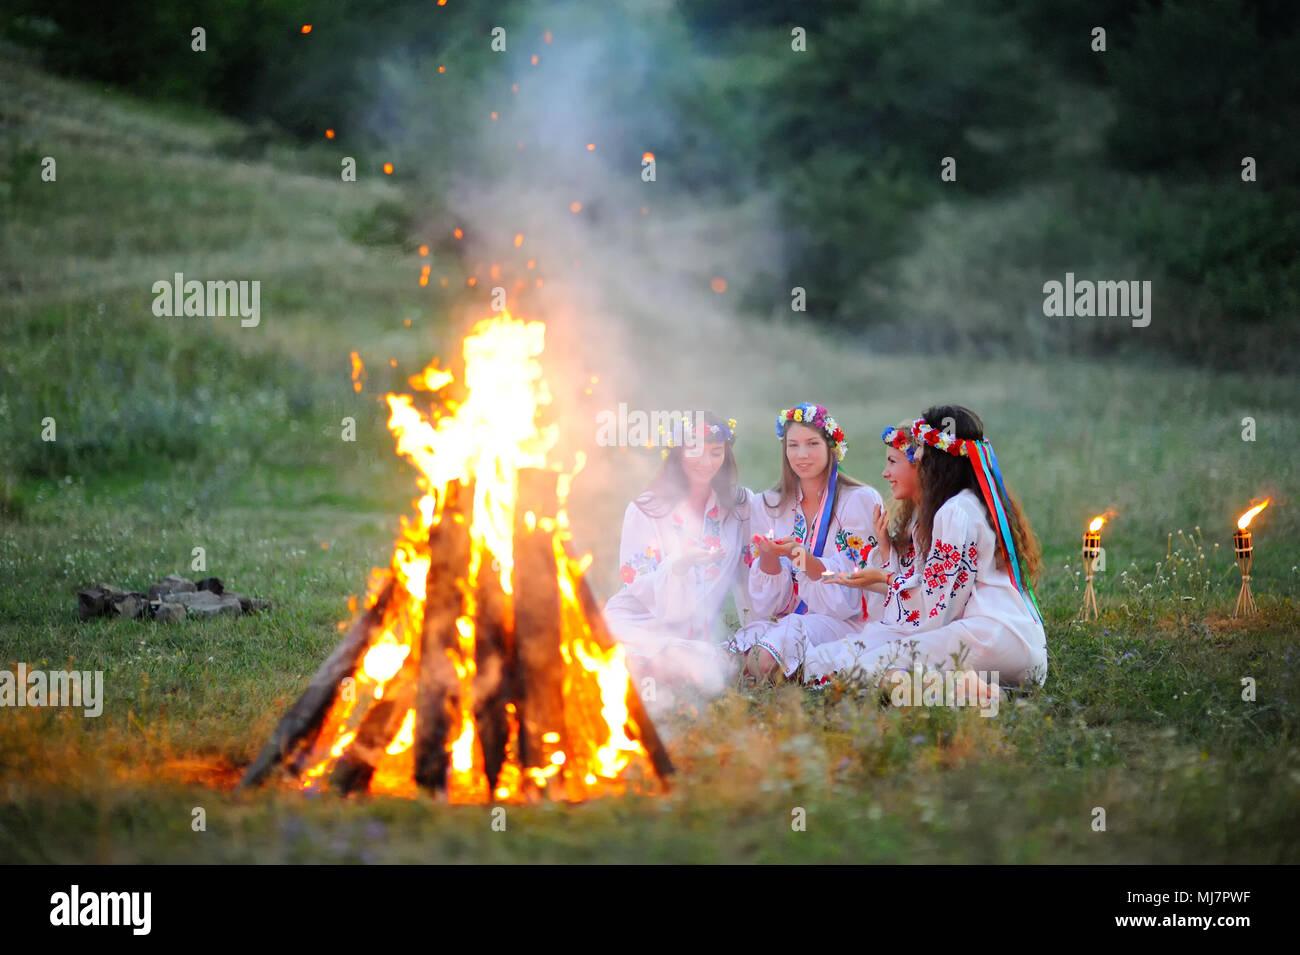 The celebration of the pagan Slavic holiday of Ivan Kupala Day or Midsummer. - Stock Image